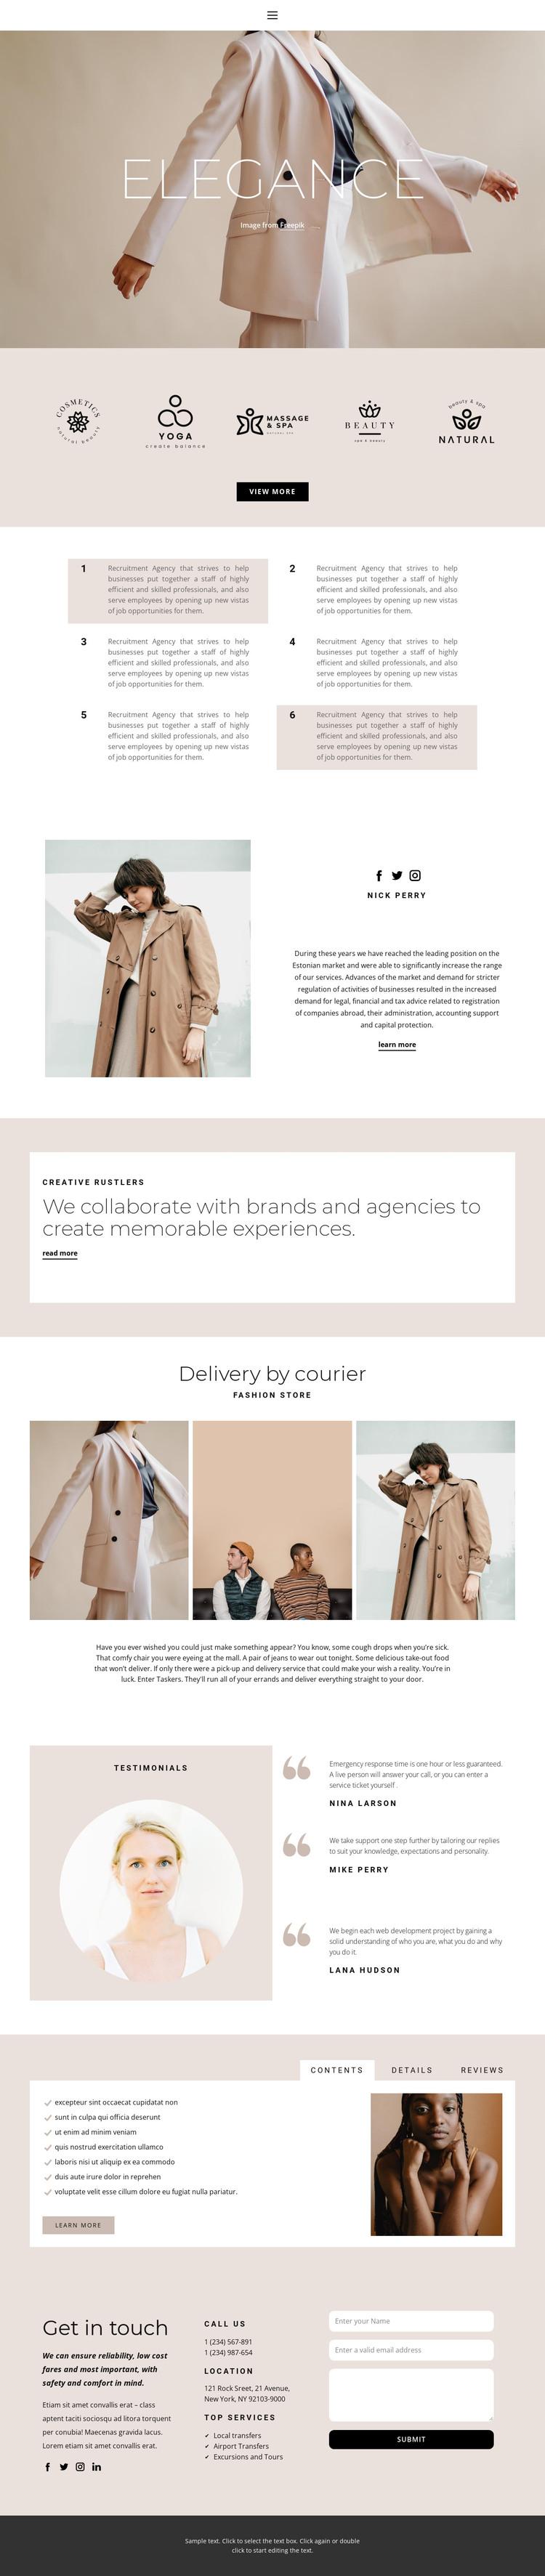 Elegance in fashion HTML Template